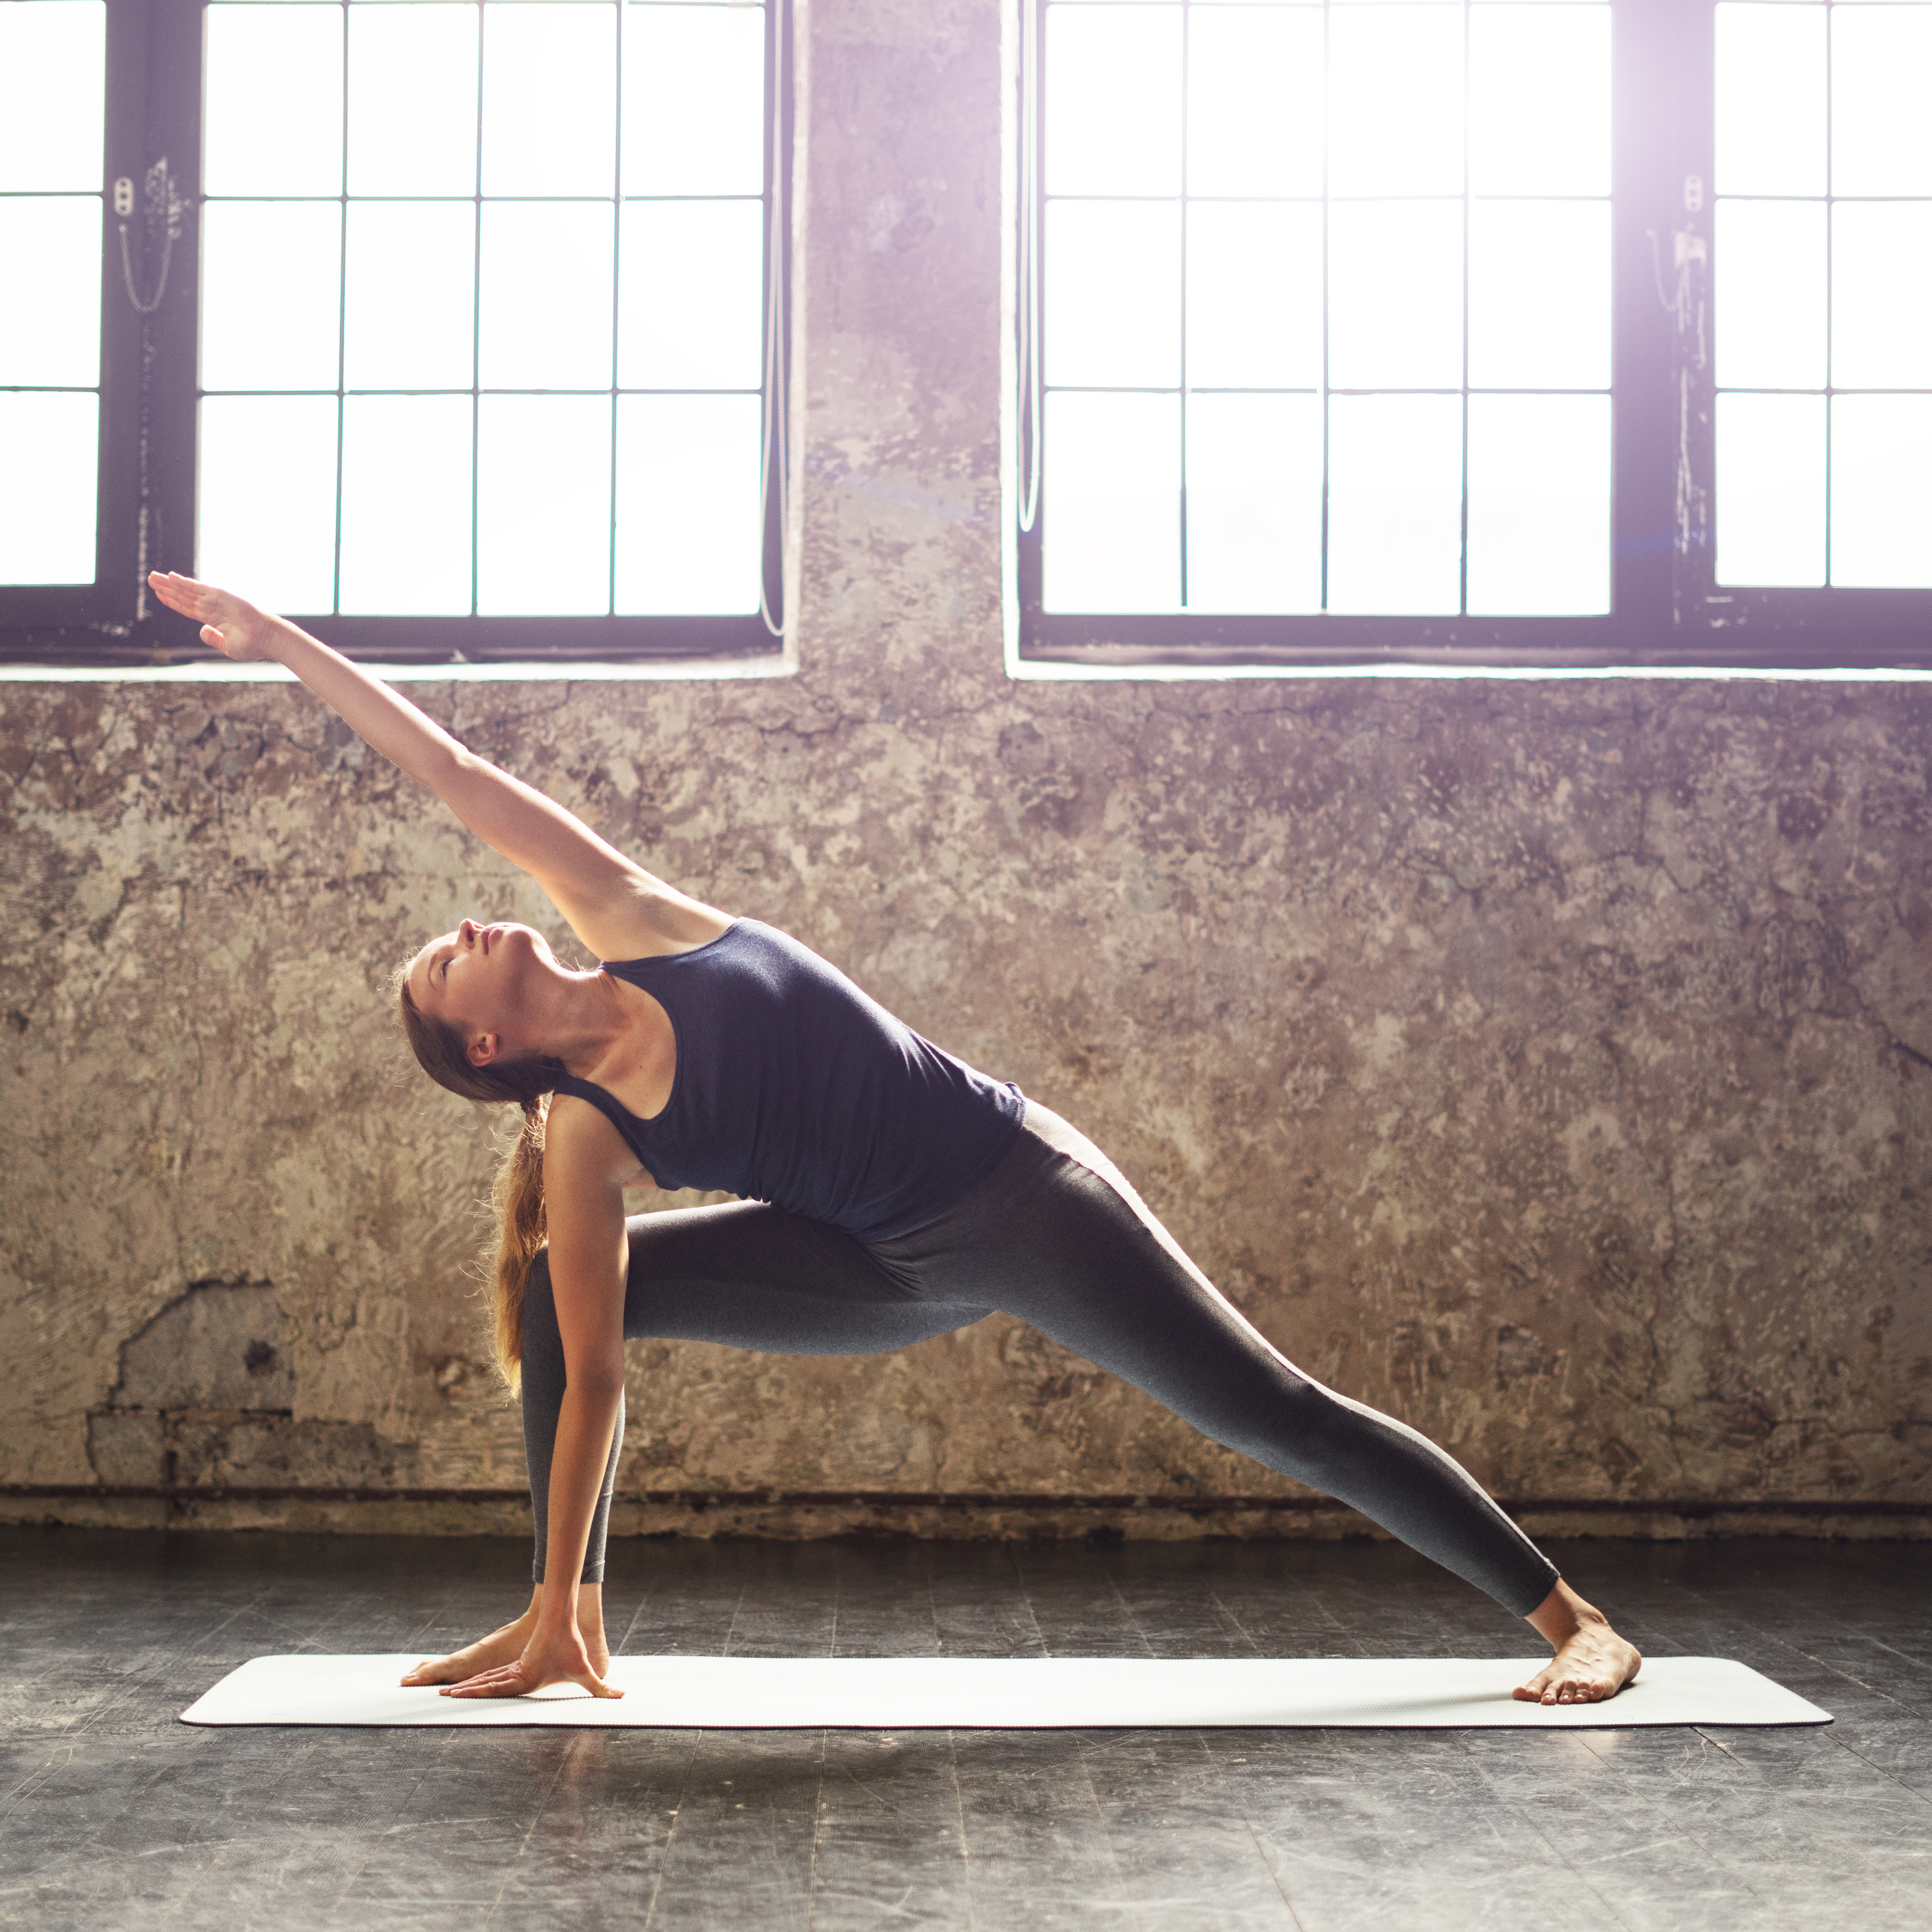 Cotton Woman Yoga Smart Apparel Technology Hero